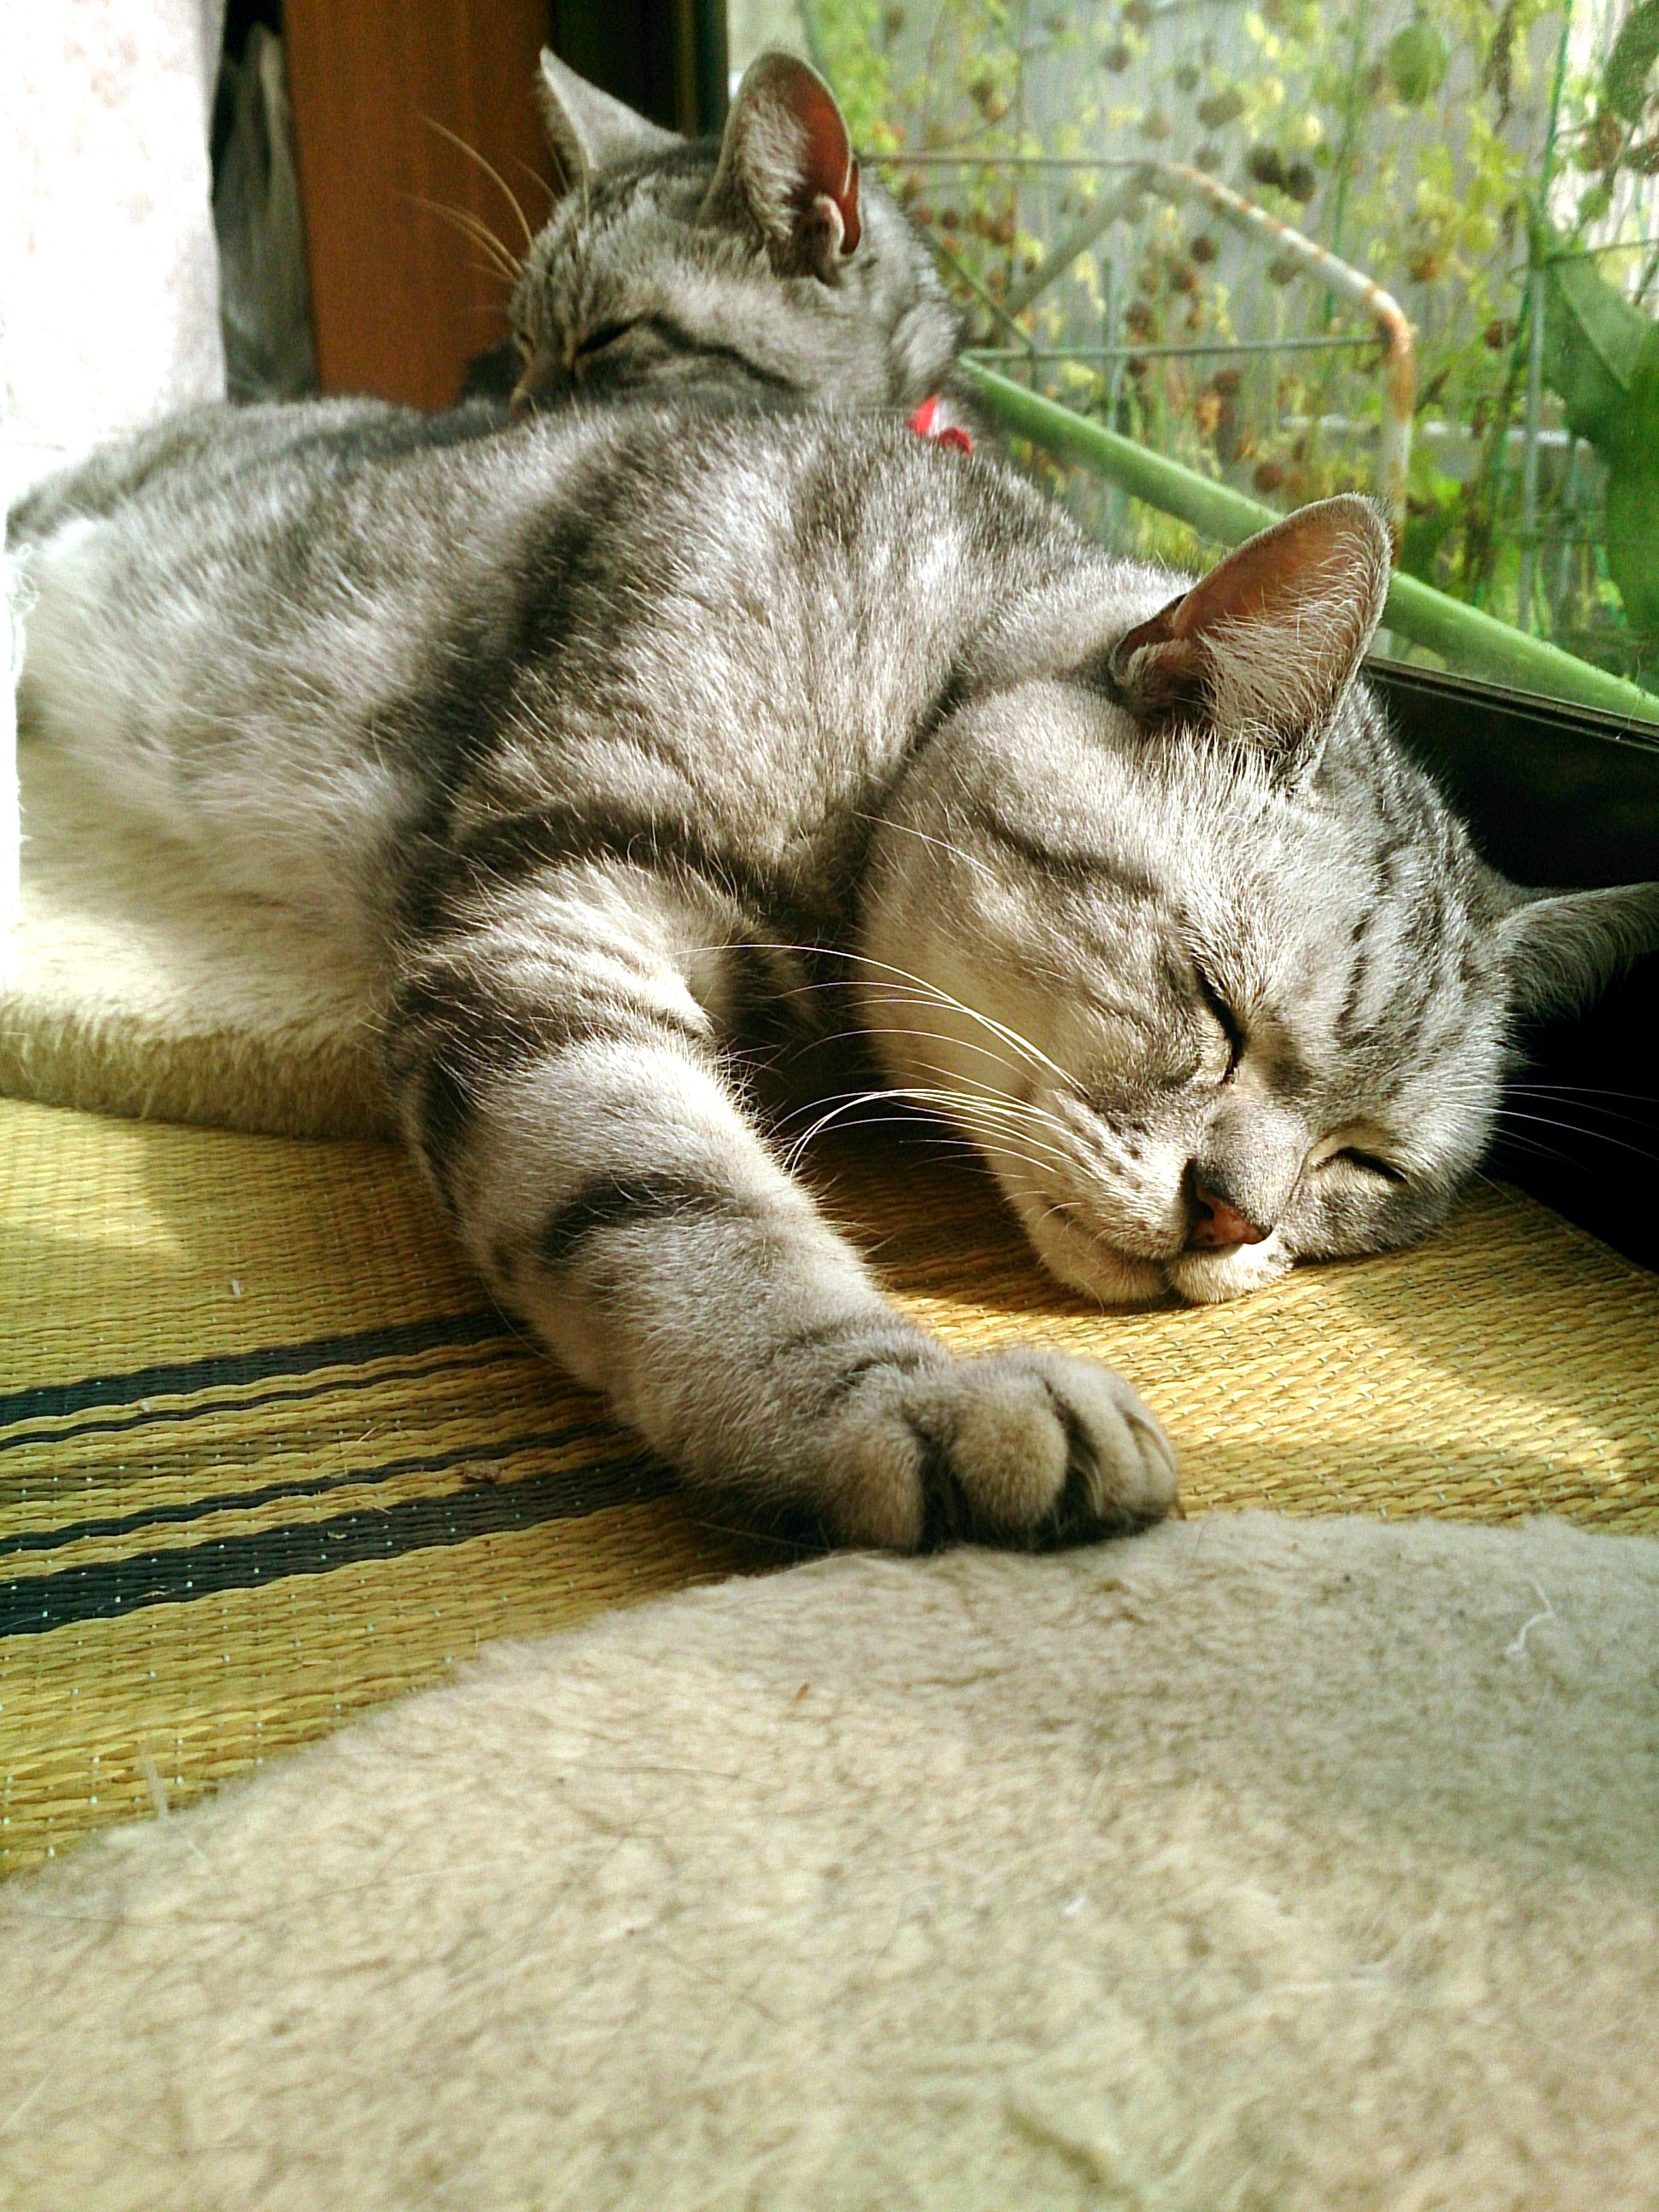 Cat_20141012-01.jpg